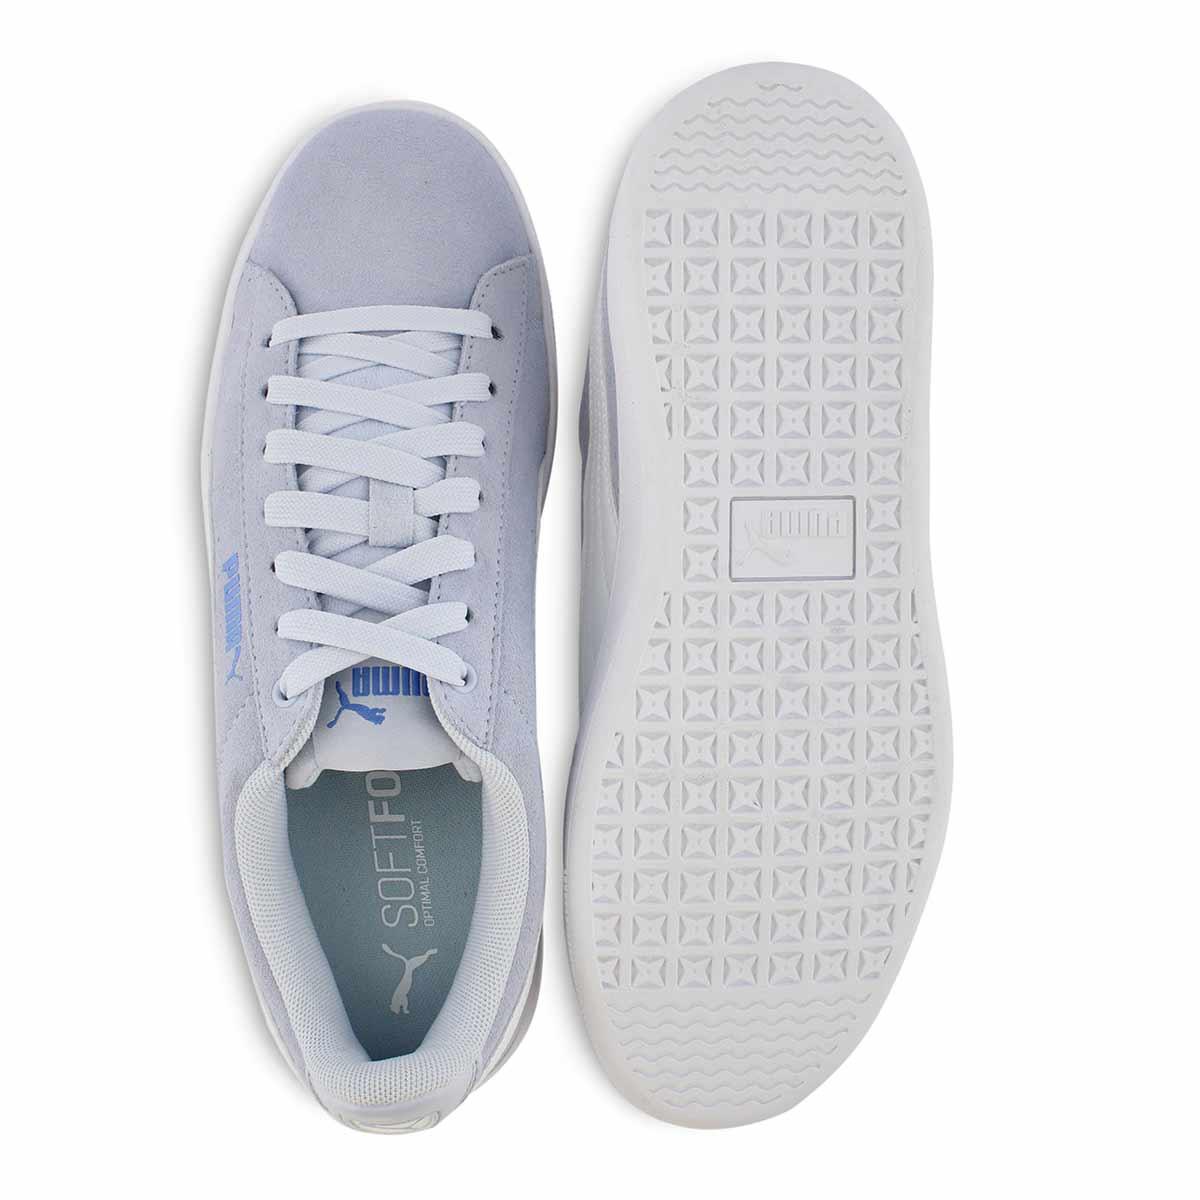 Lds Puma Vikky v2 ultramarine sneaker